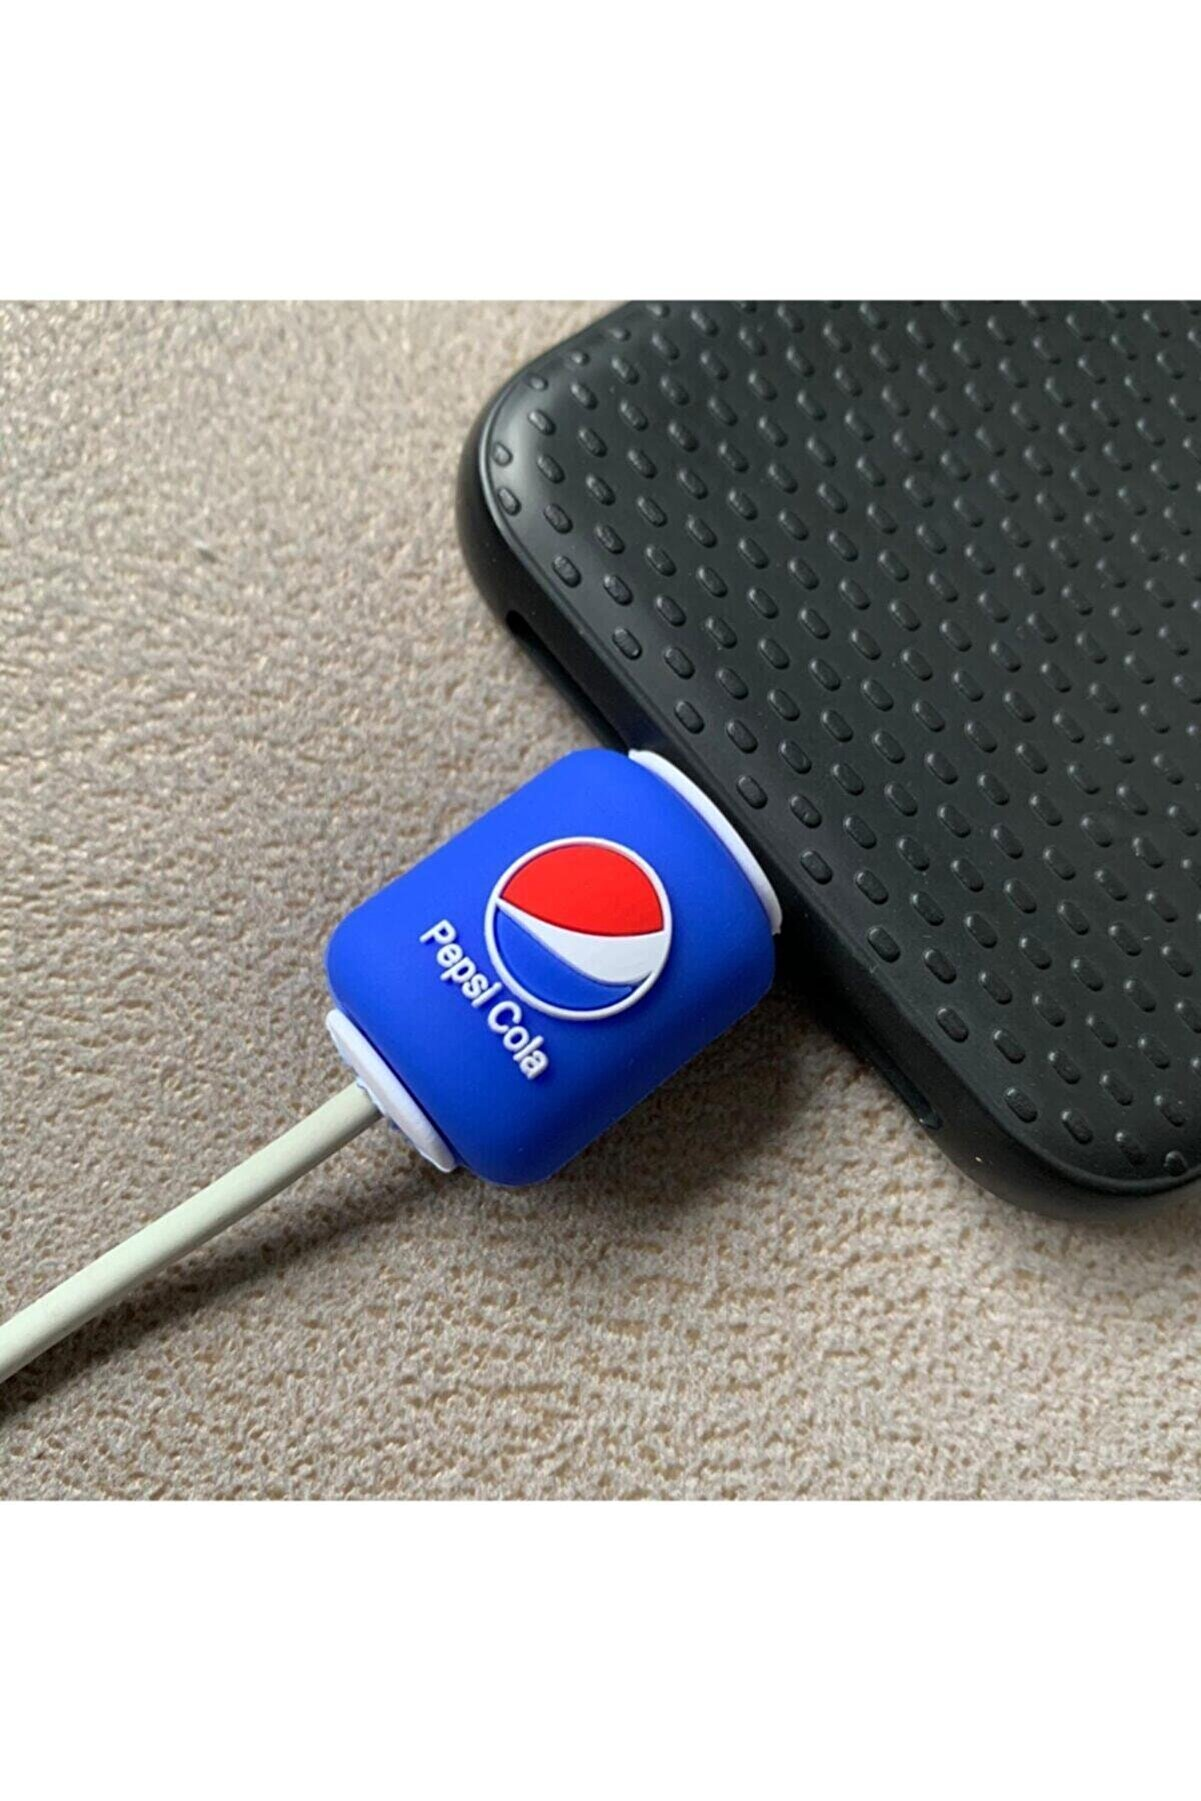 SUPPO Sevimli Silikon Kablo Koruyucu